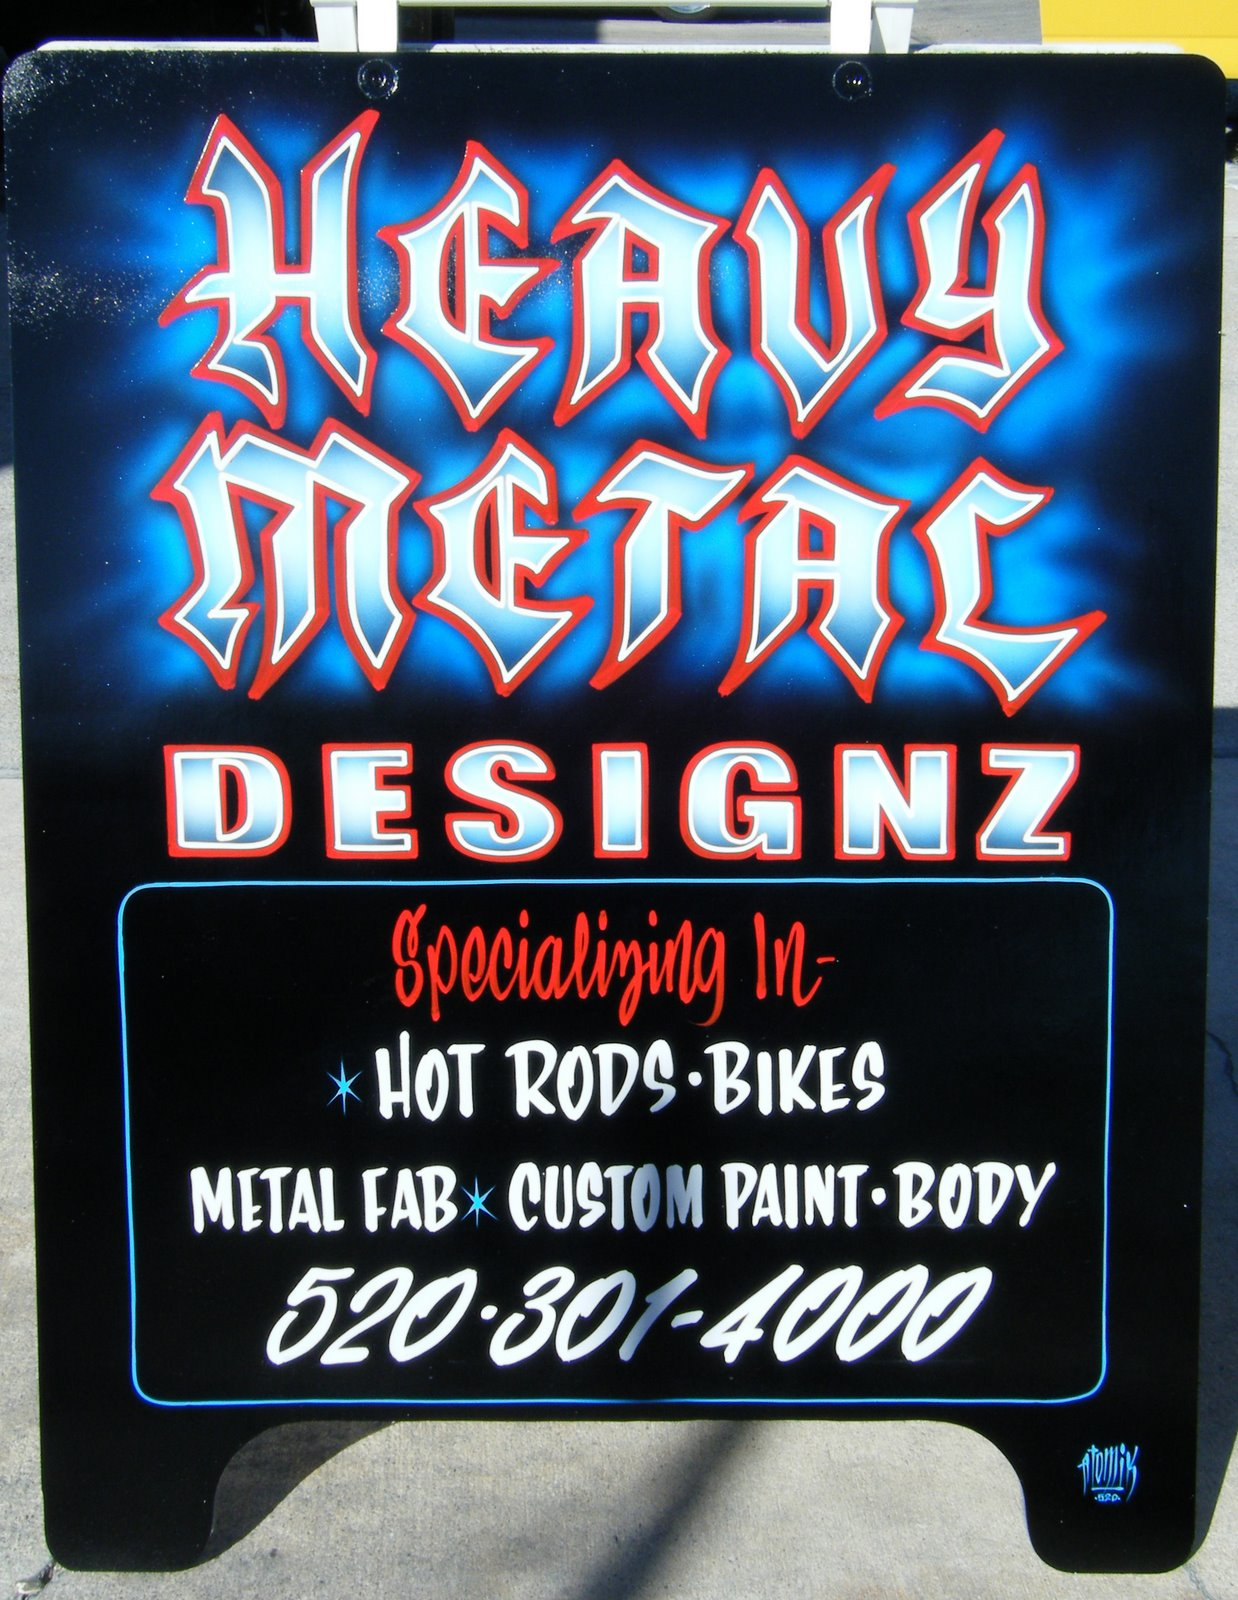 [heavy+metal+designz+A-frame.jpg+blog]